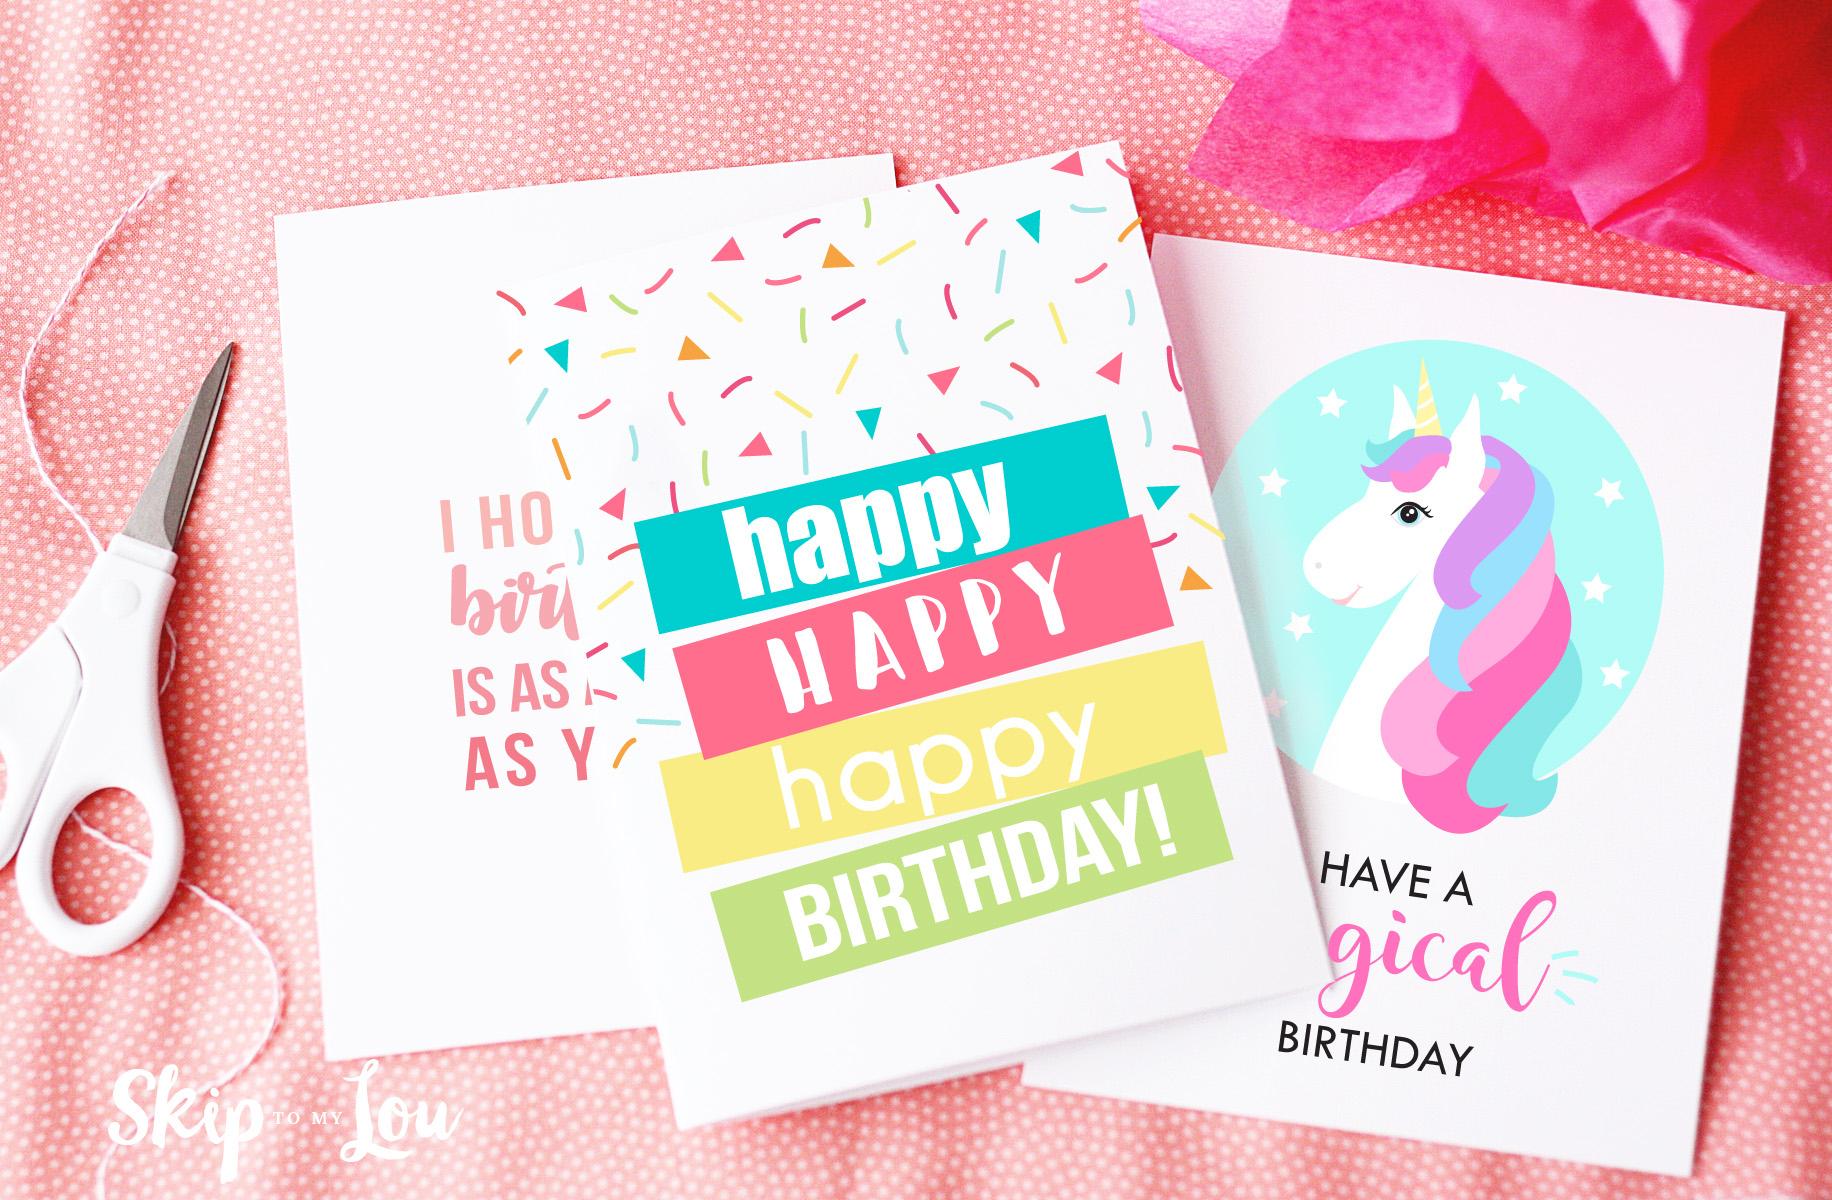 Free Printable Birthday Cards   Skip To My Lou - Free Printable Birthday Cards For Adults